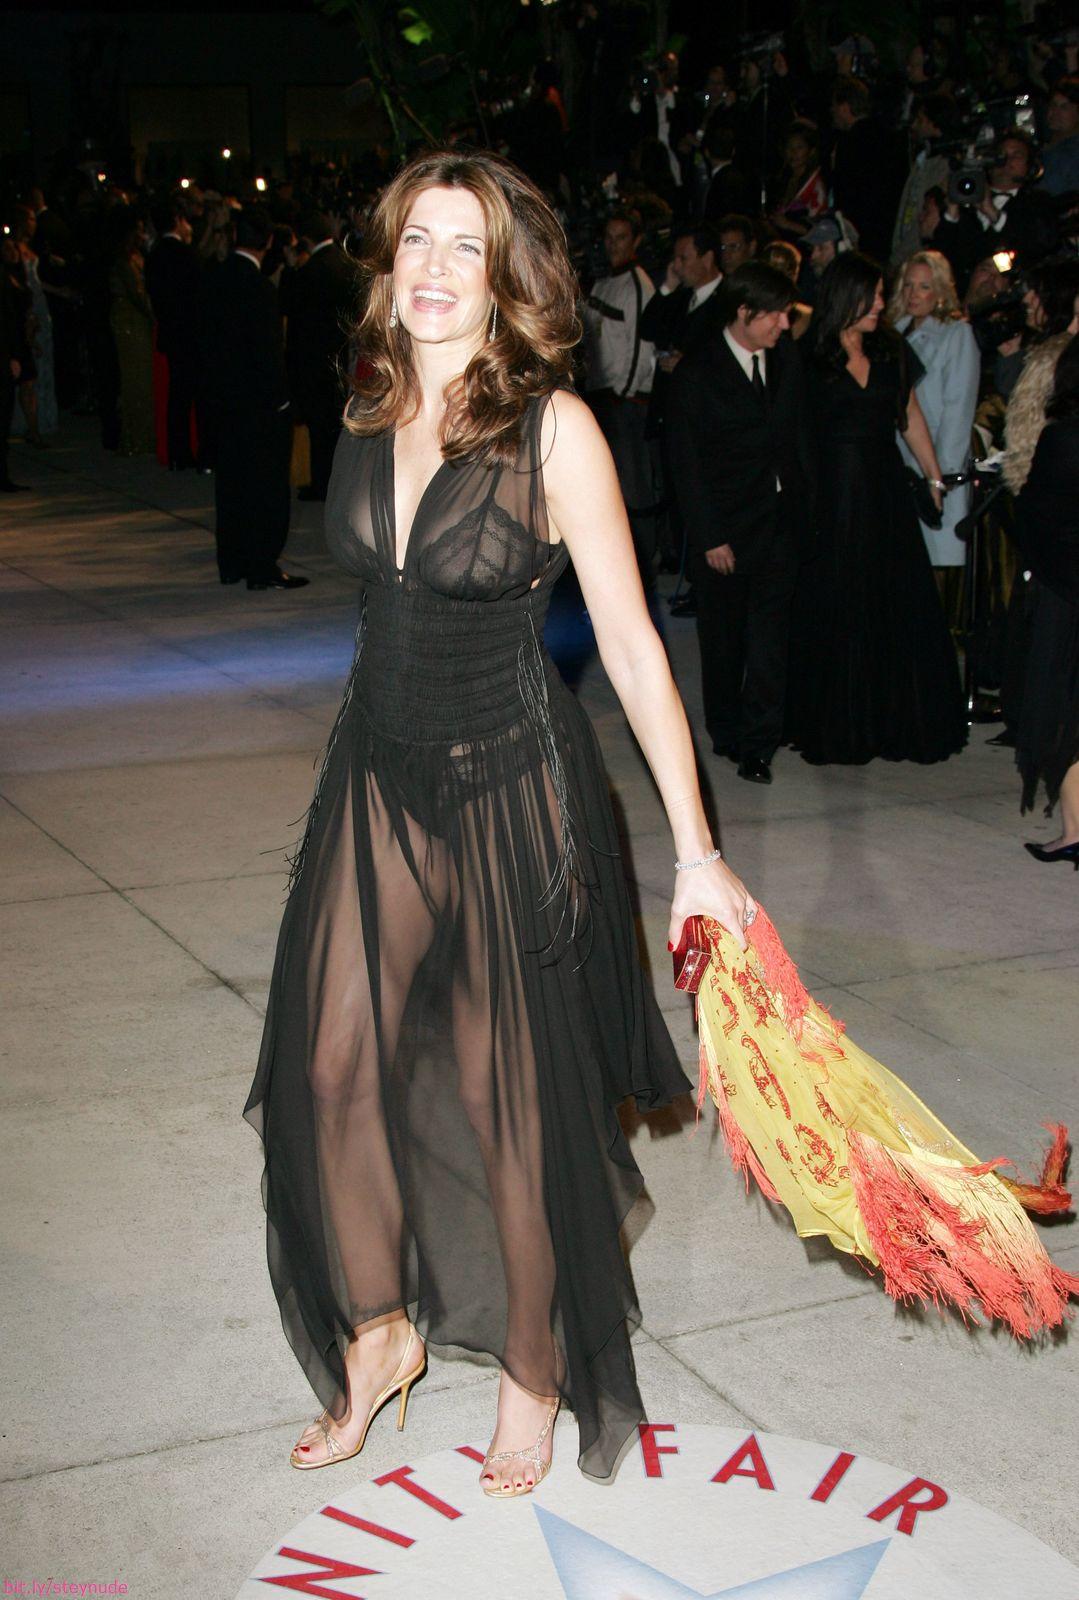 Stephanie Seymour Nude - She's the Perfect Trophy Wife! (97 PICS)